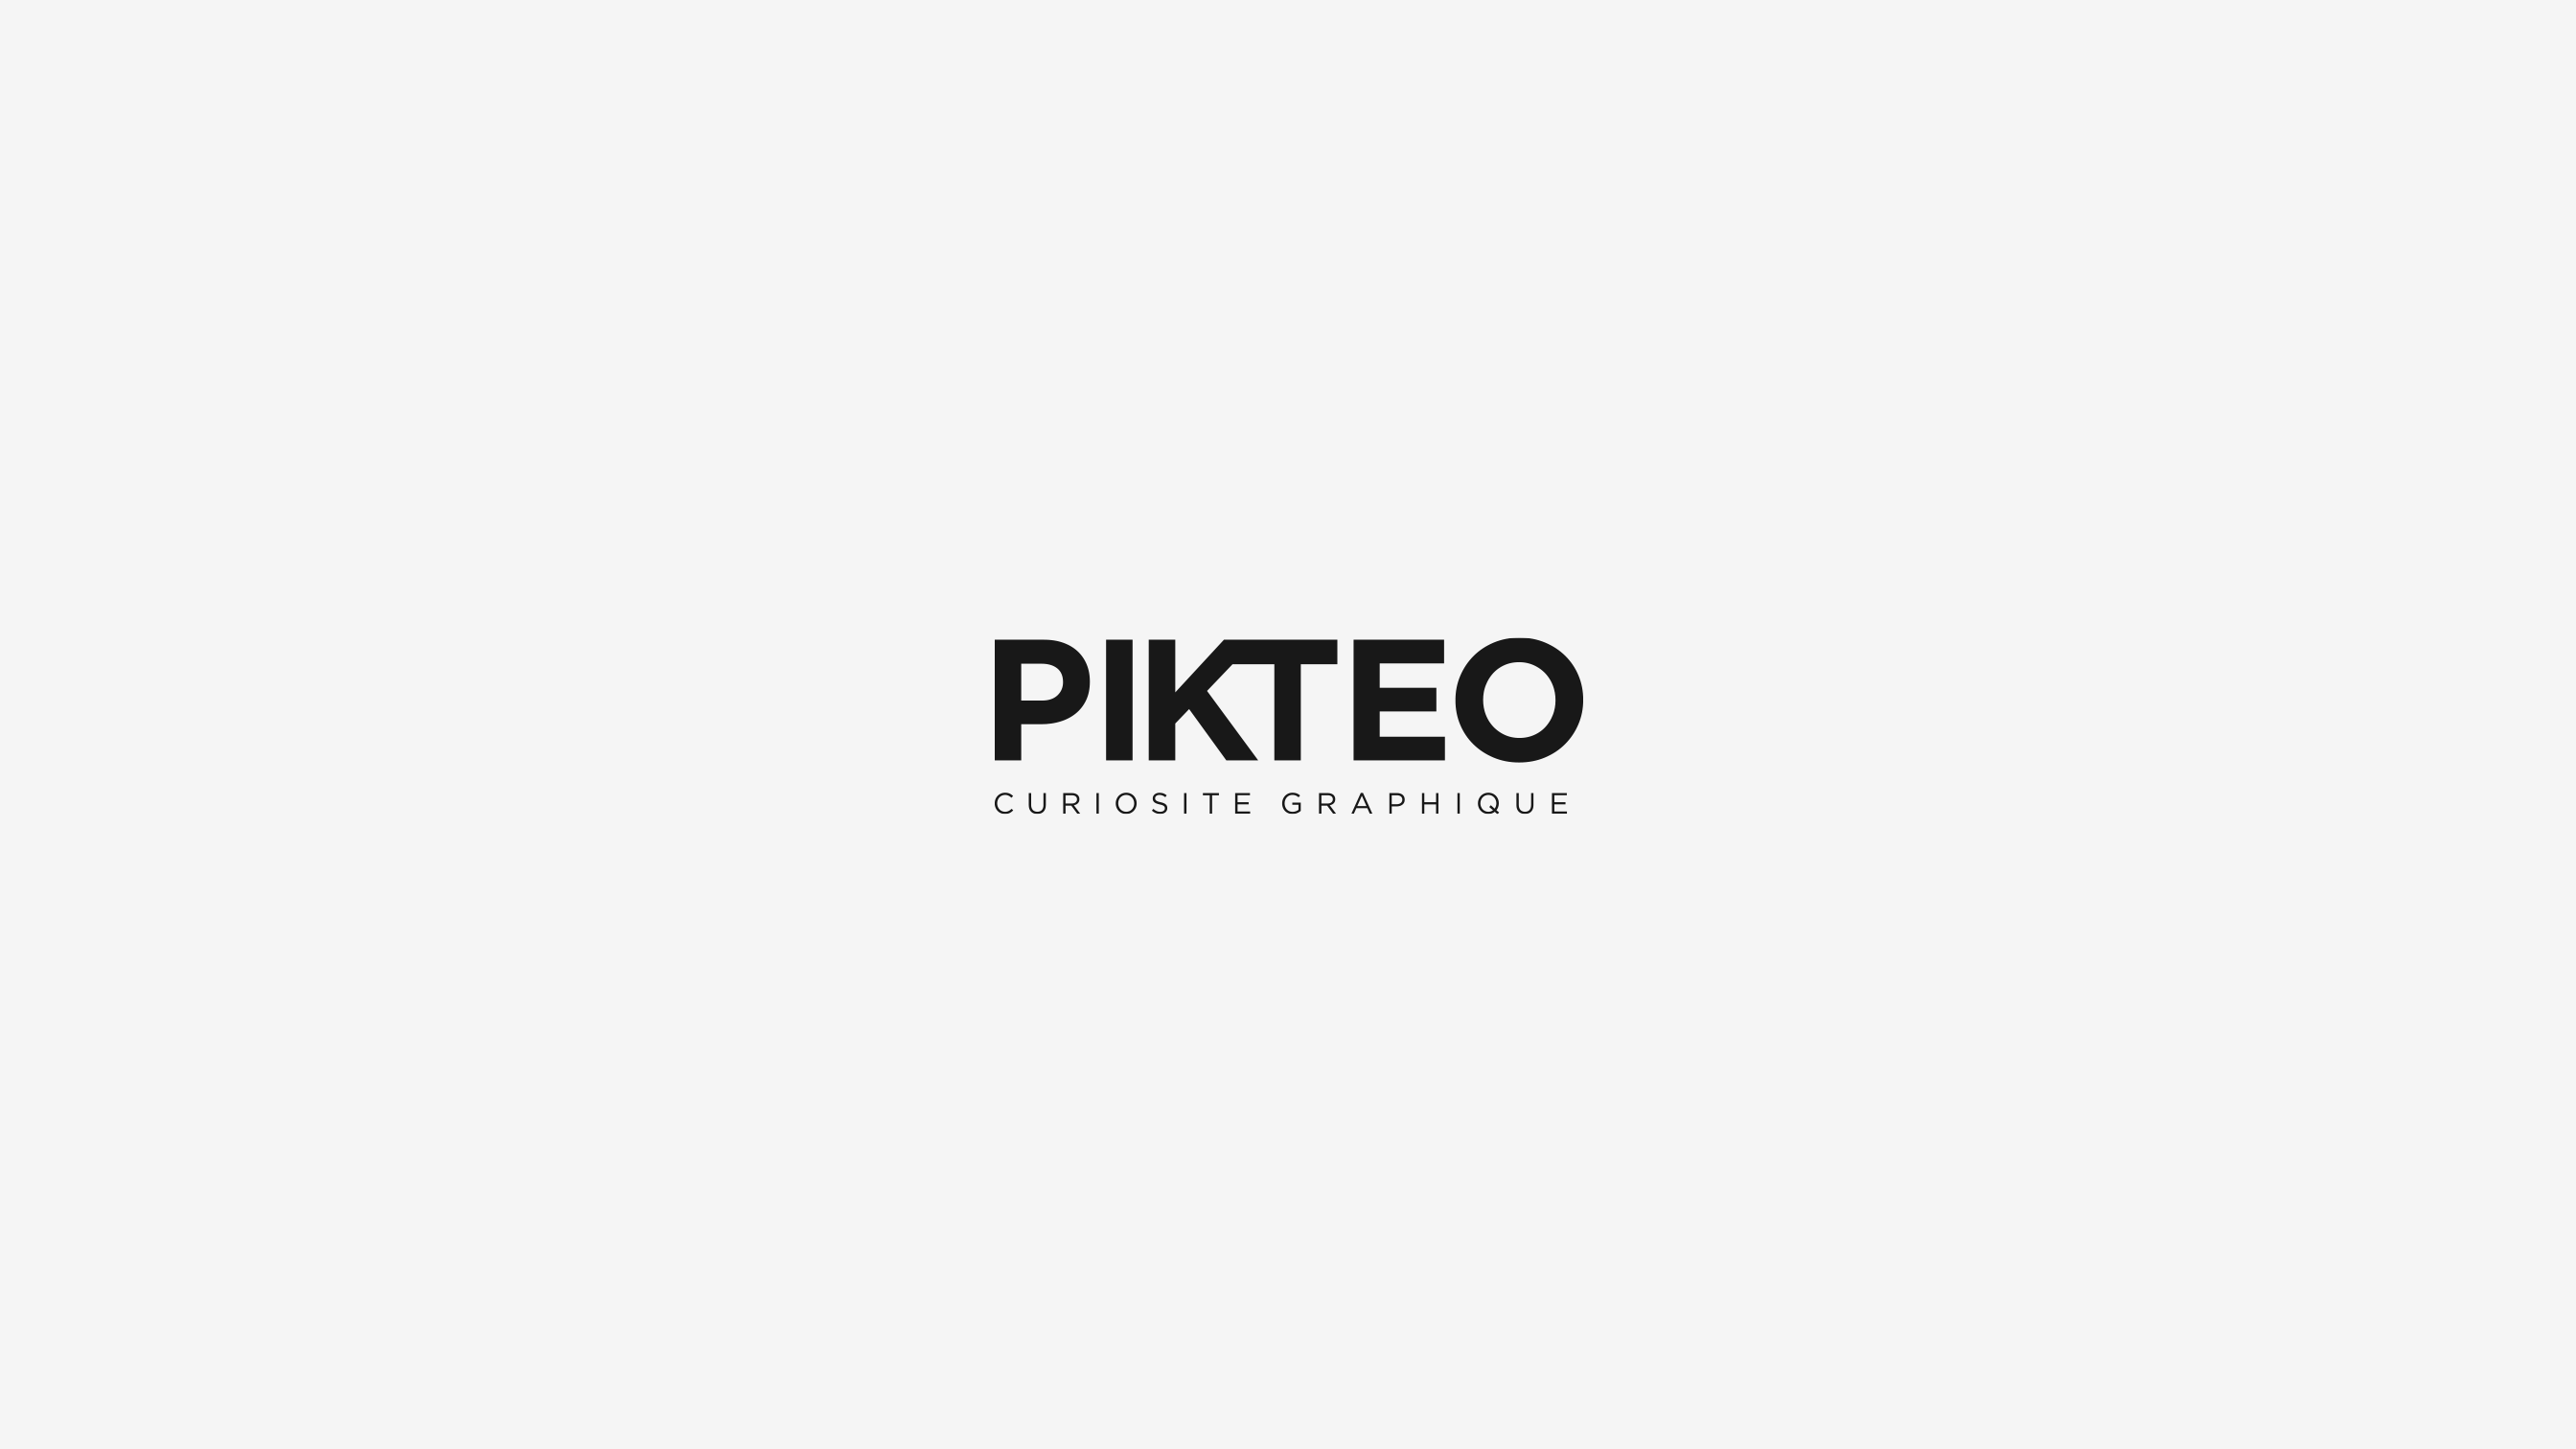 pikteo-logo-pikteo